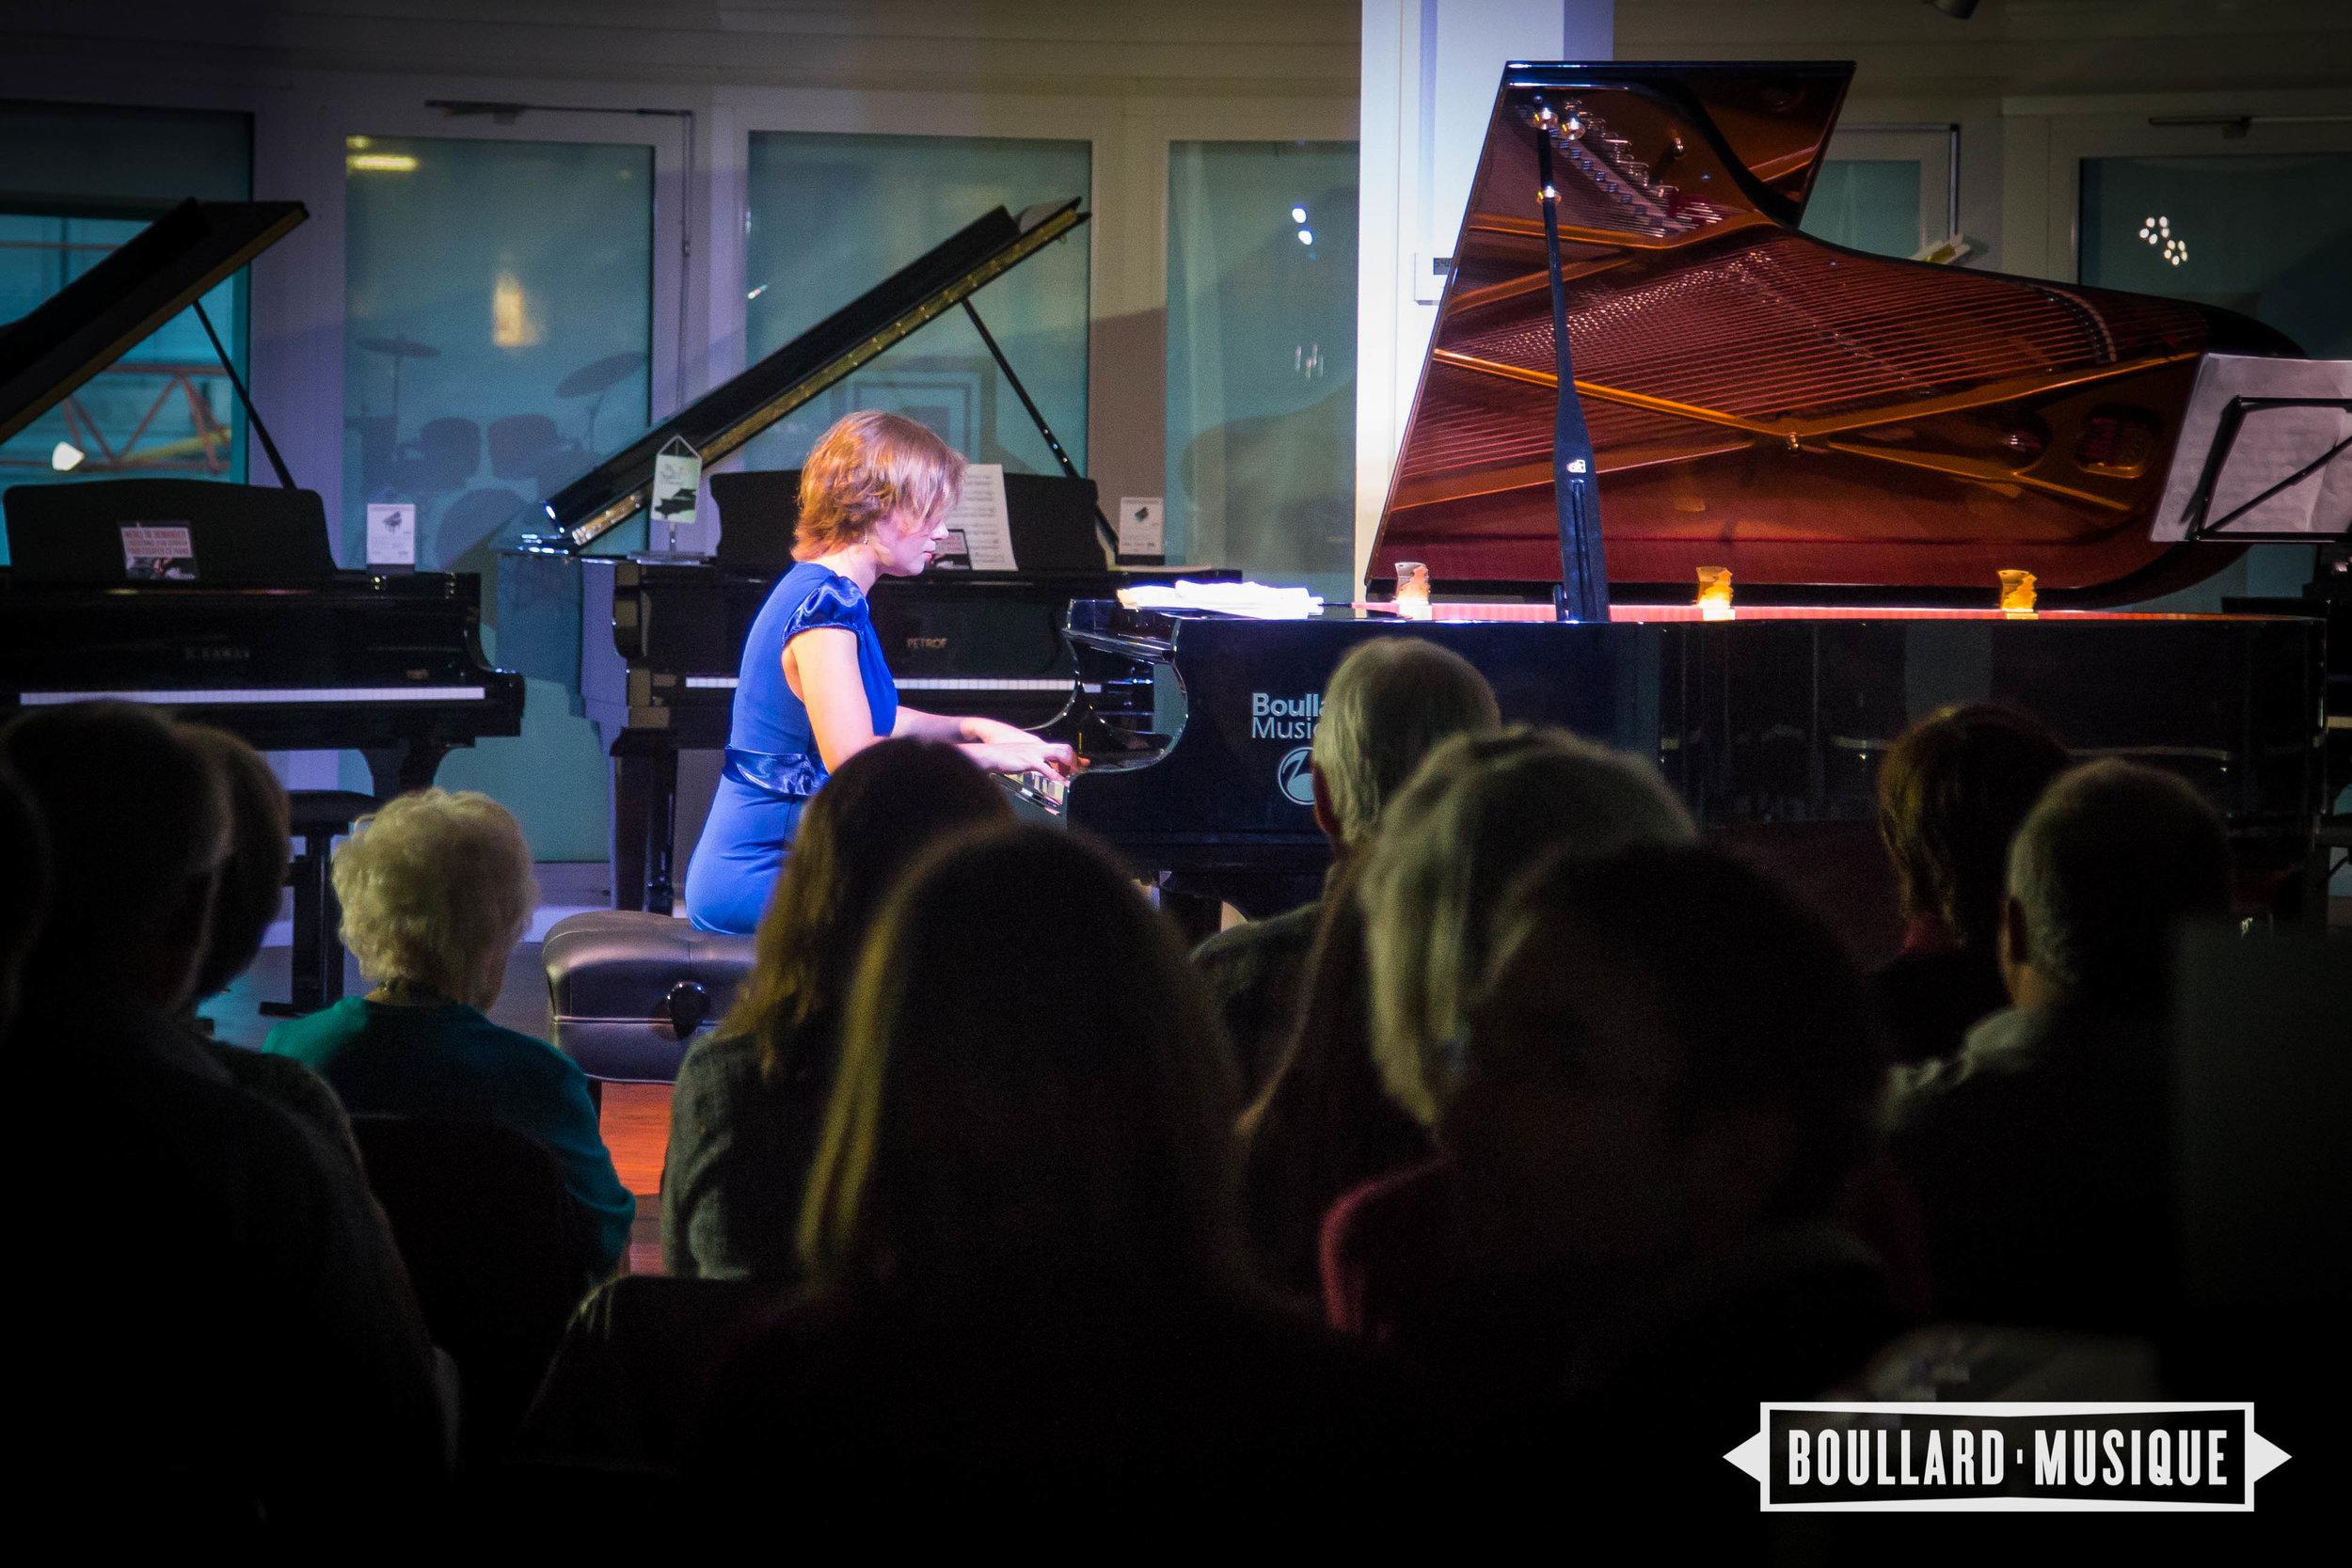 concert-piano--violon--anna-semkina--liza-martynova_36718945033_o.jpg